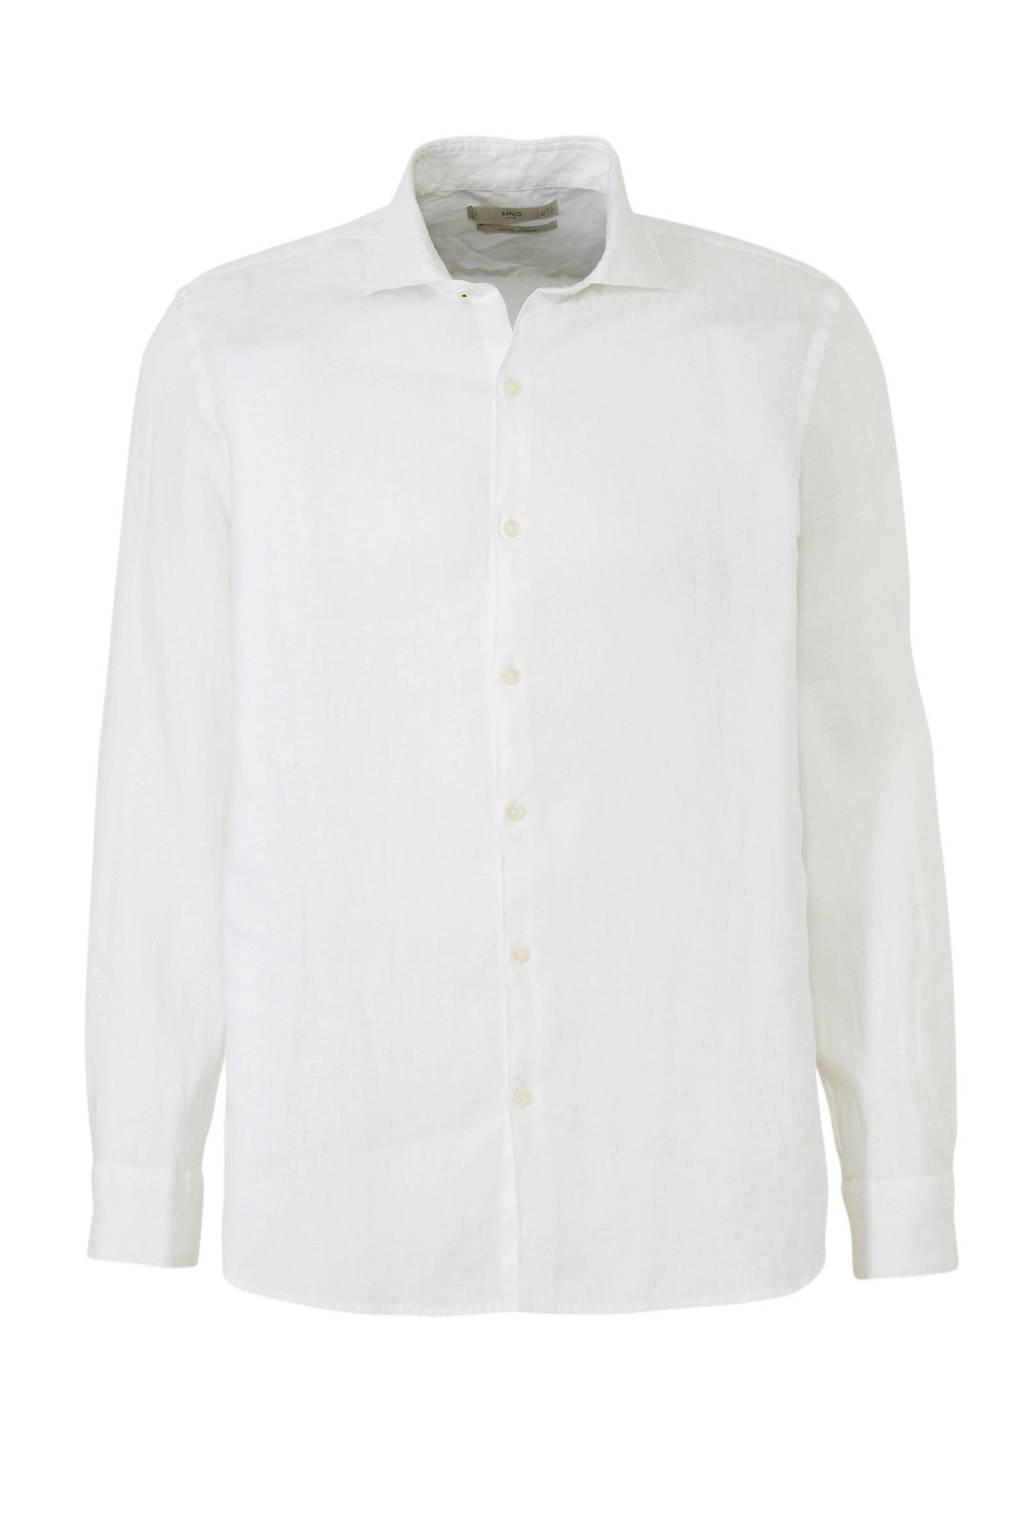 Overhemd Wit Slim Fit.Mango Man Linnen Slim Fit Overhemd Wit Wehkamp